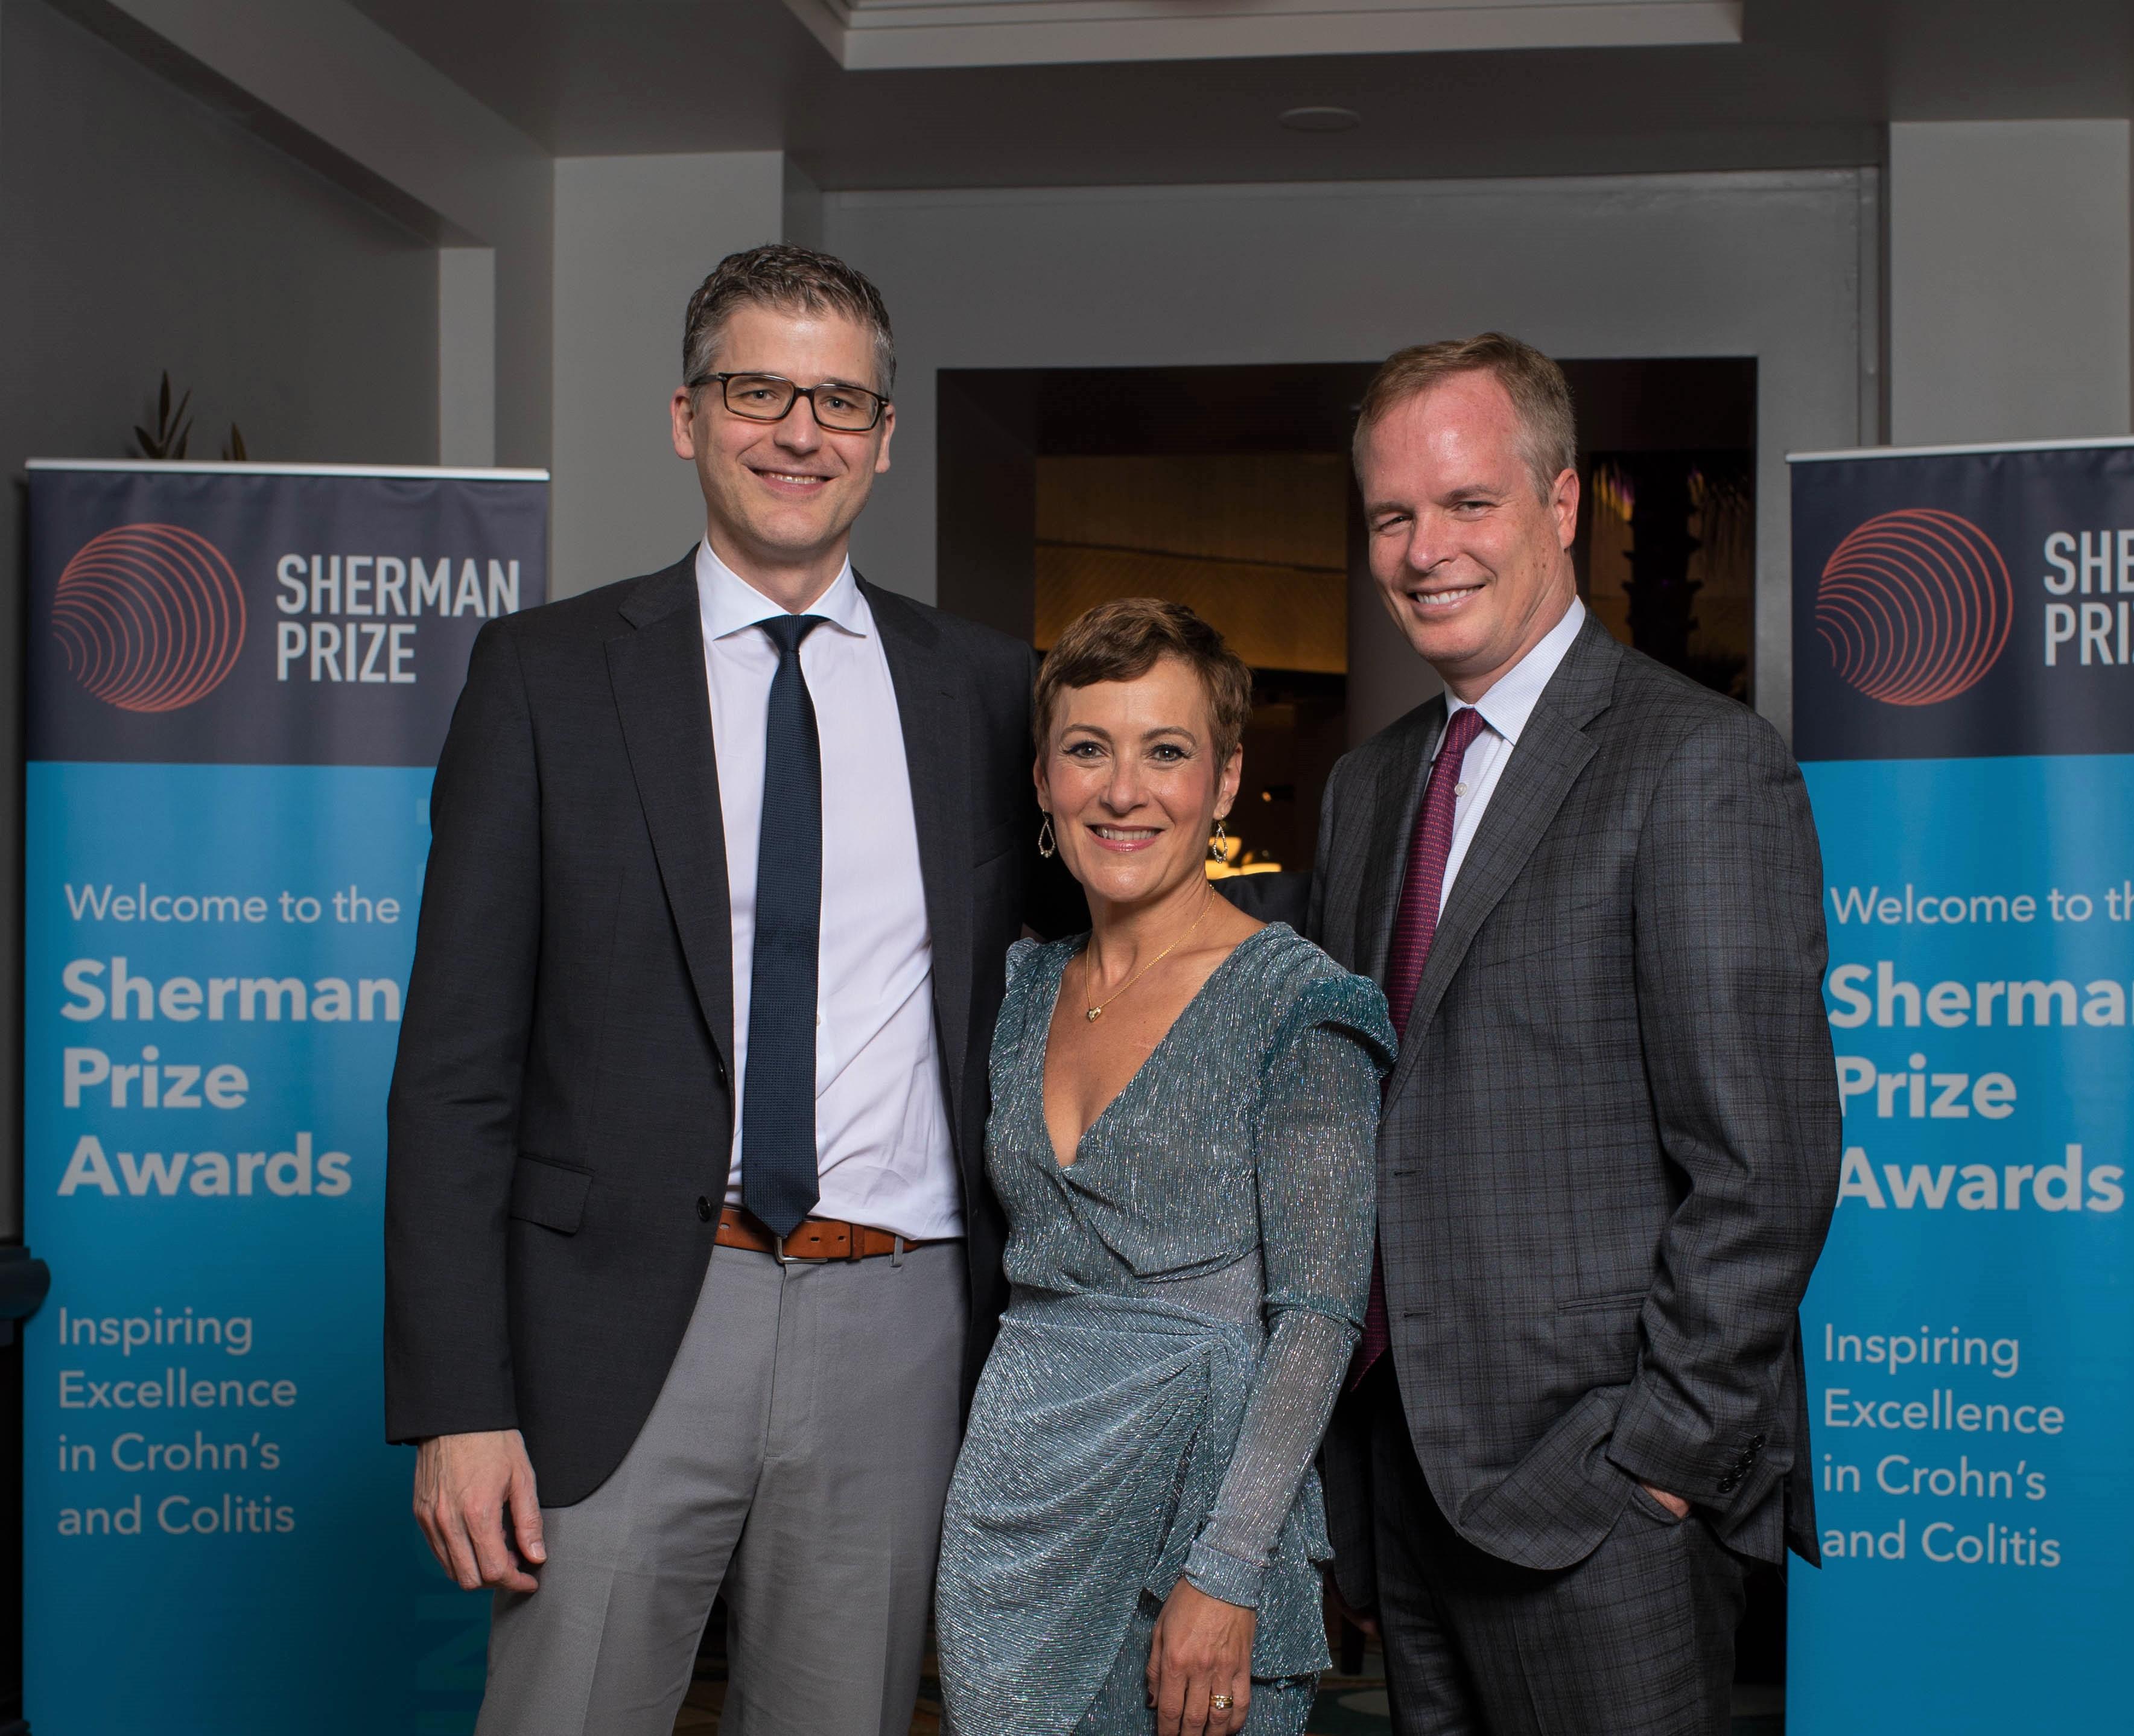 <p>2019 Sherman Prize Recipients: Dr. Florian Rieder, Dr. Maria Abreu, and Dr. William Sandborn</p>